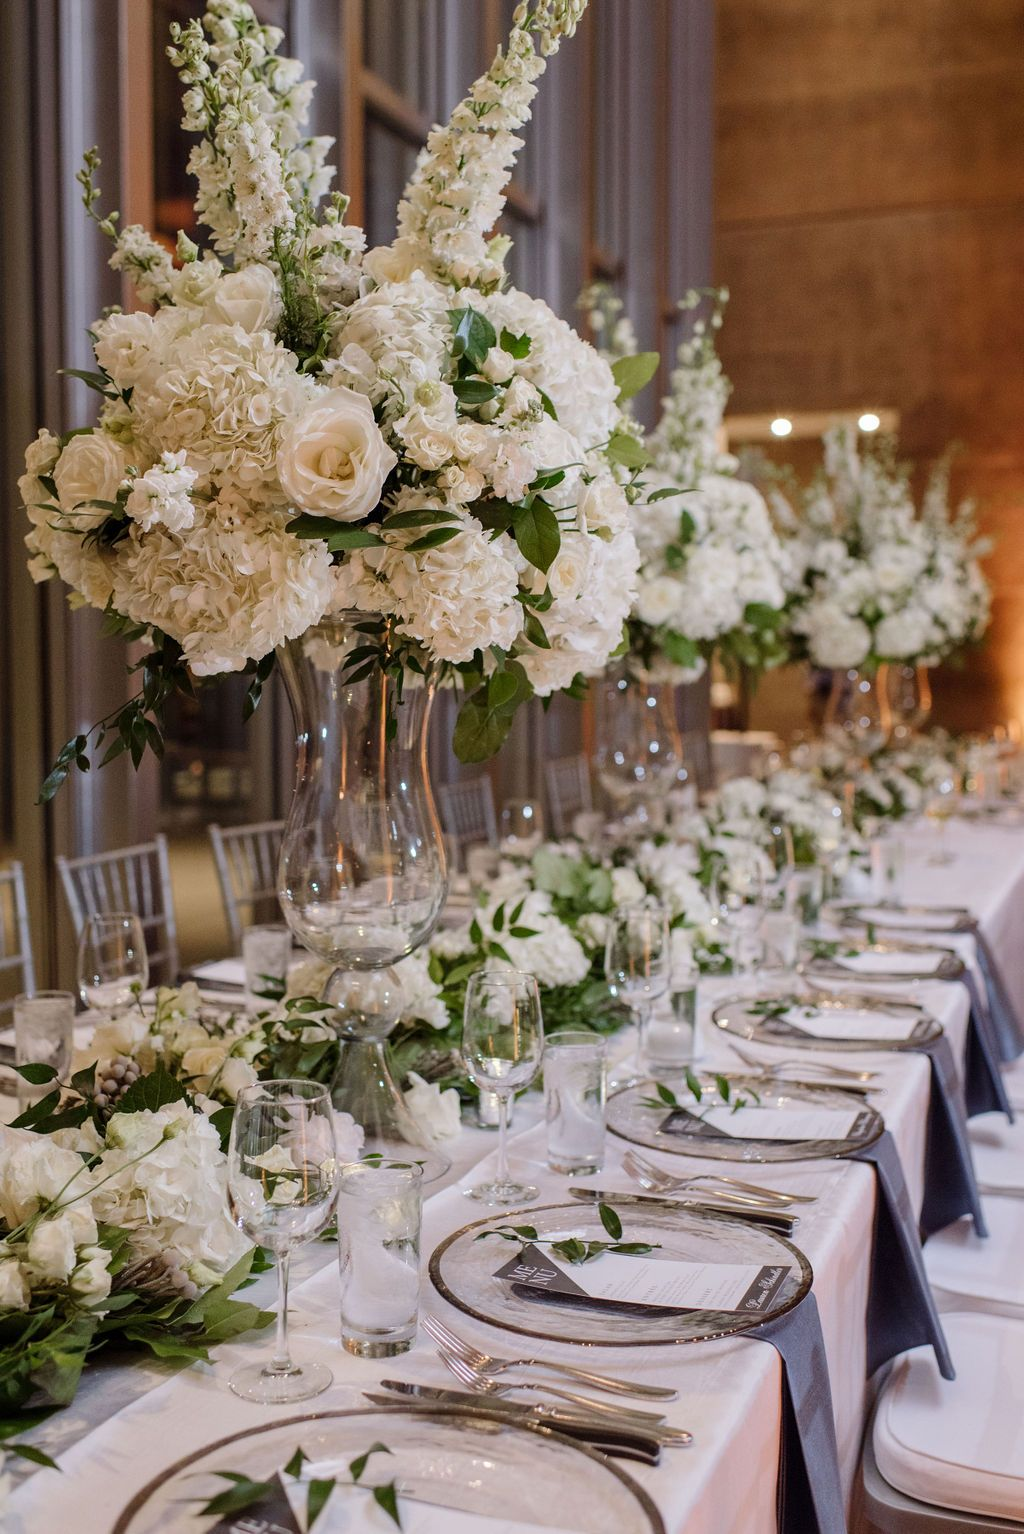 Classic Garden Wedding White Centerpiece Wedding Centerpieces White Flower Centerpieces Wedding Reception Centerpieces